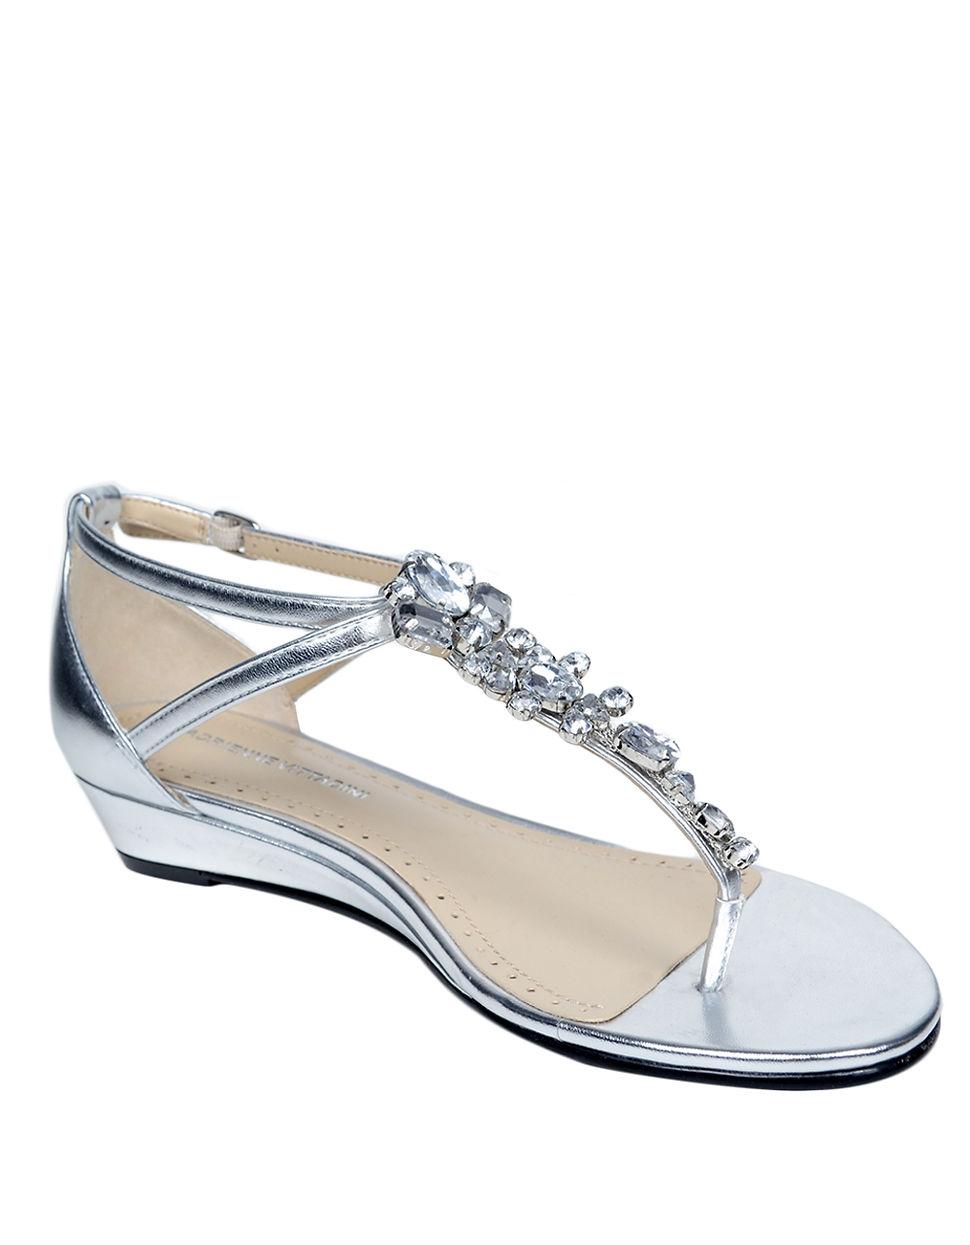 Lyst Adrienne Vittadini Veaber Leather Rhinestone T Strap Wedge Sandals In Metallic